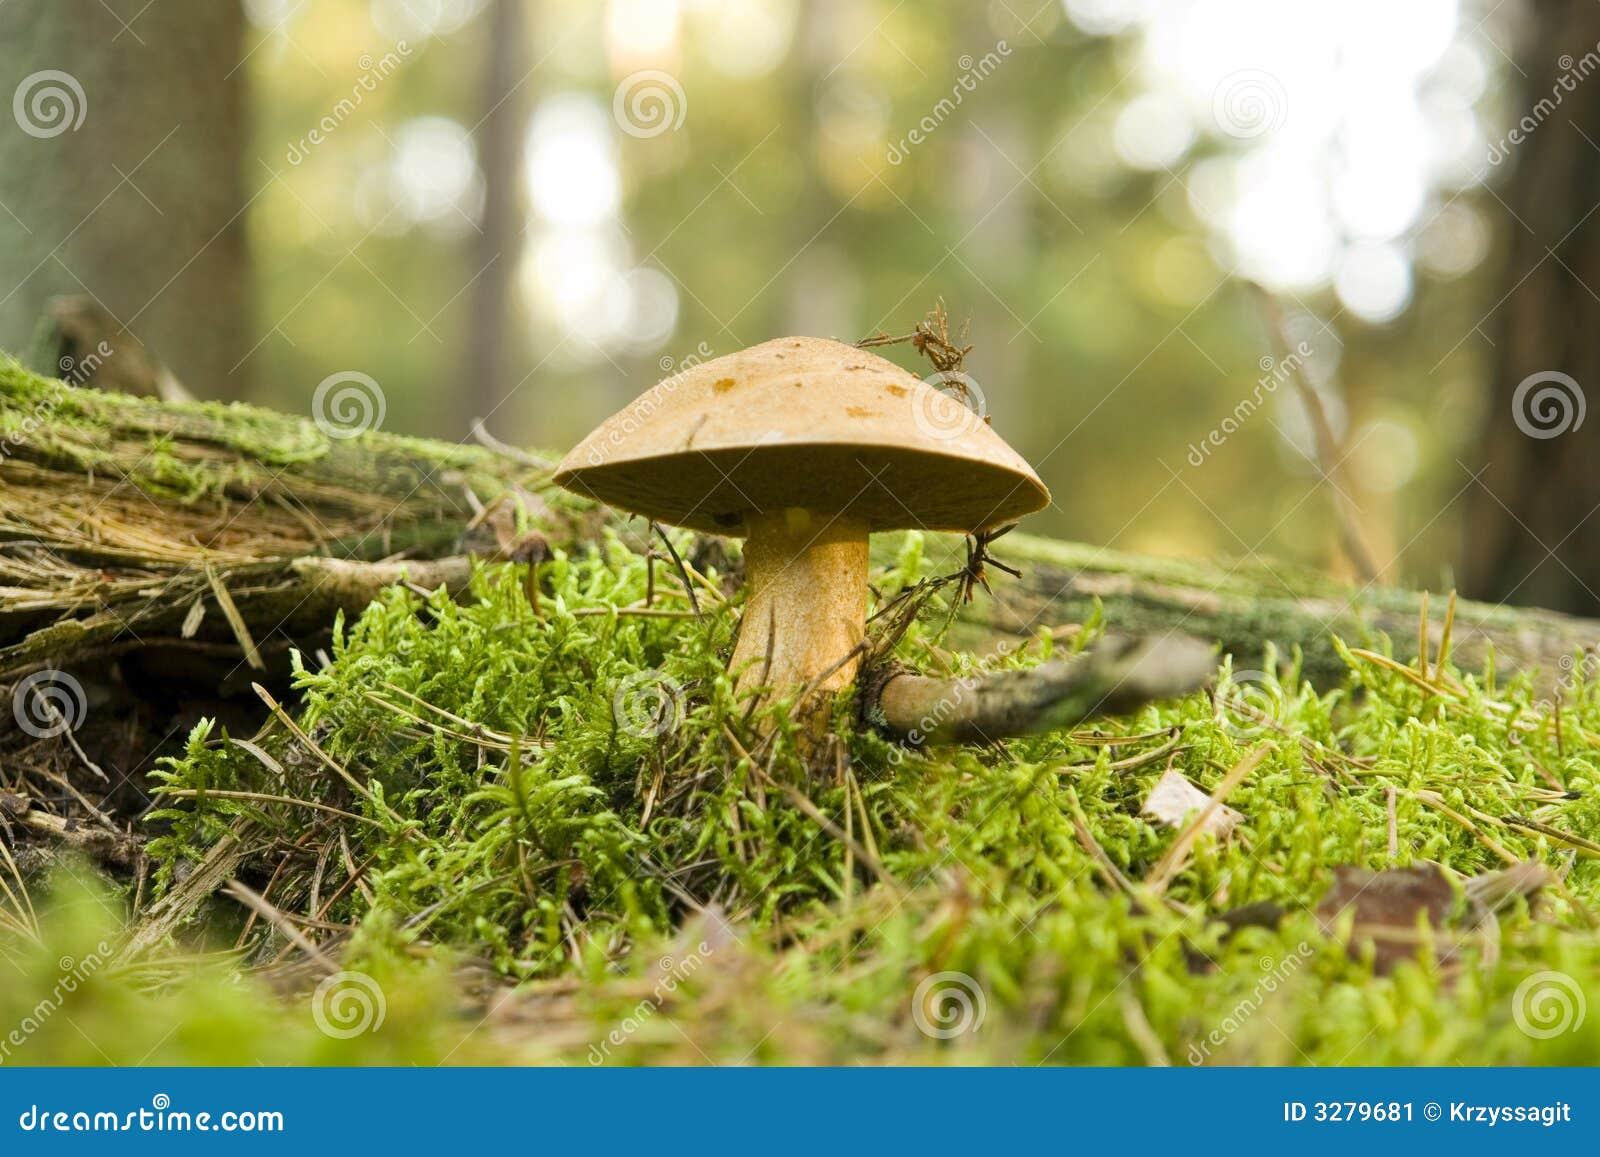 http://thumbs.dreamstime.com/z/woodland-mushroom-3279681.jpg